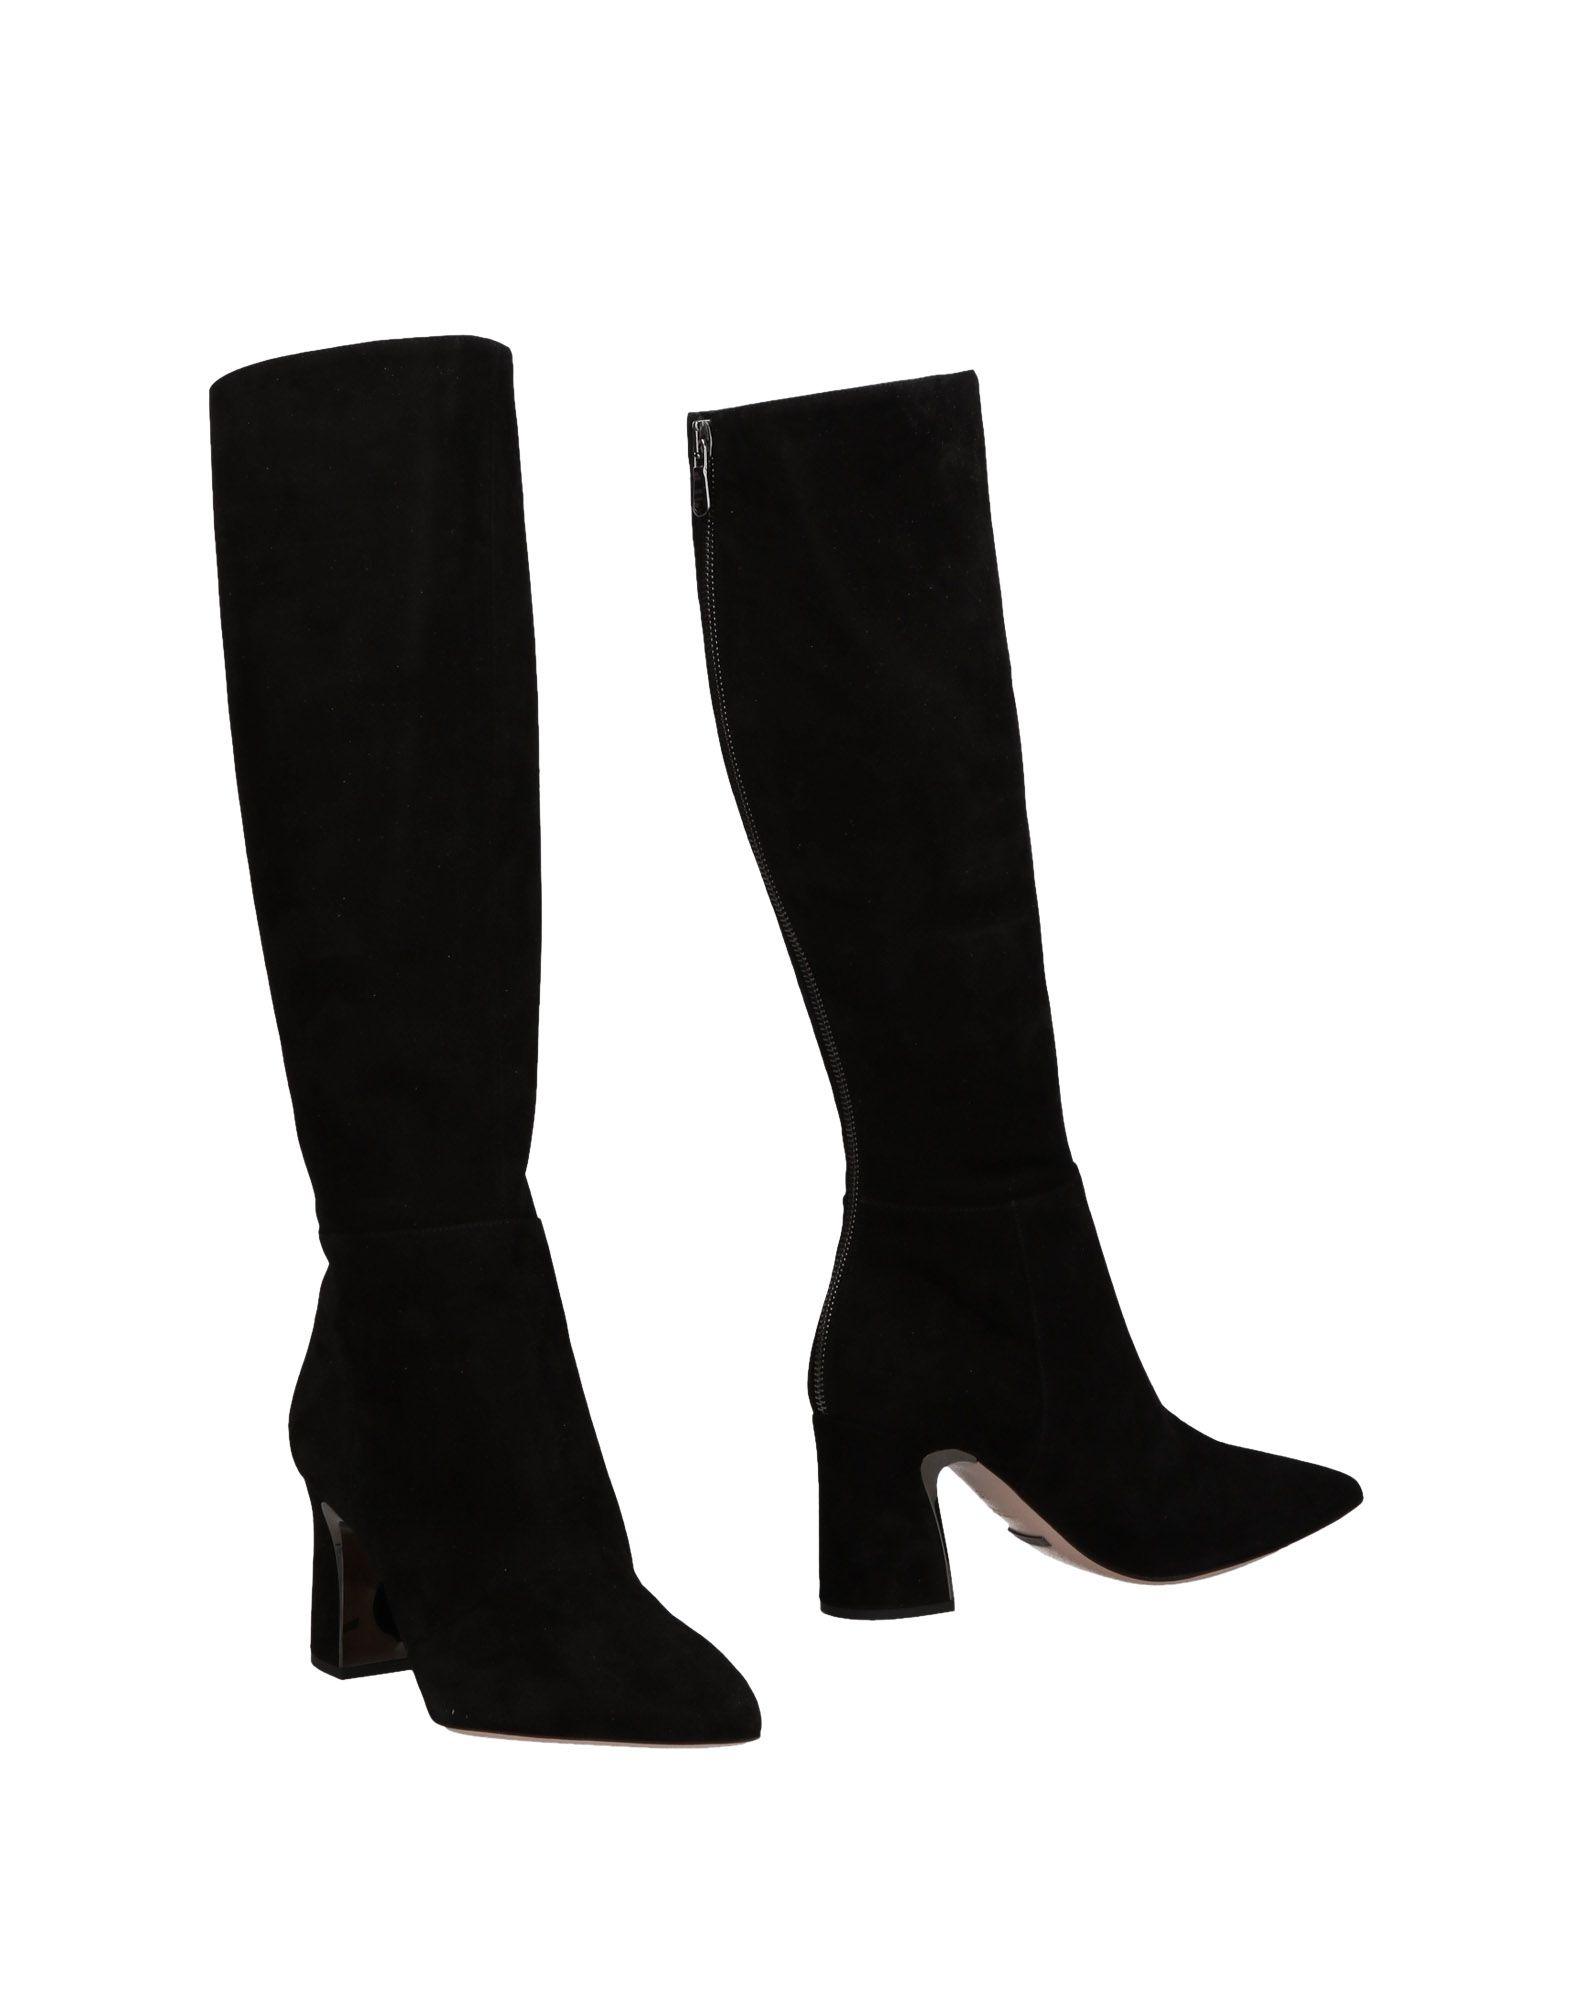 SEBASTIAN Boots in Black